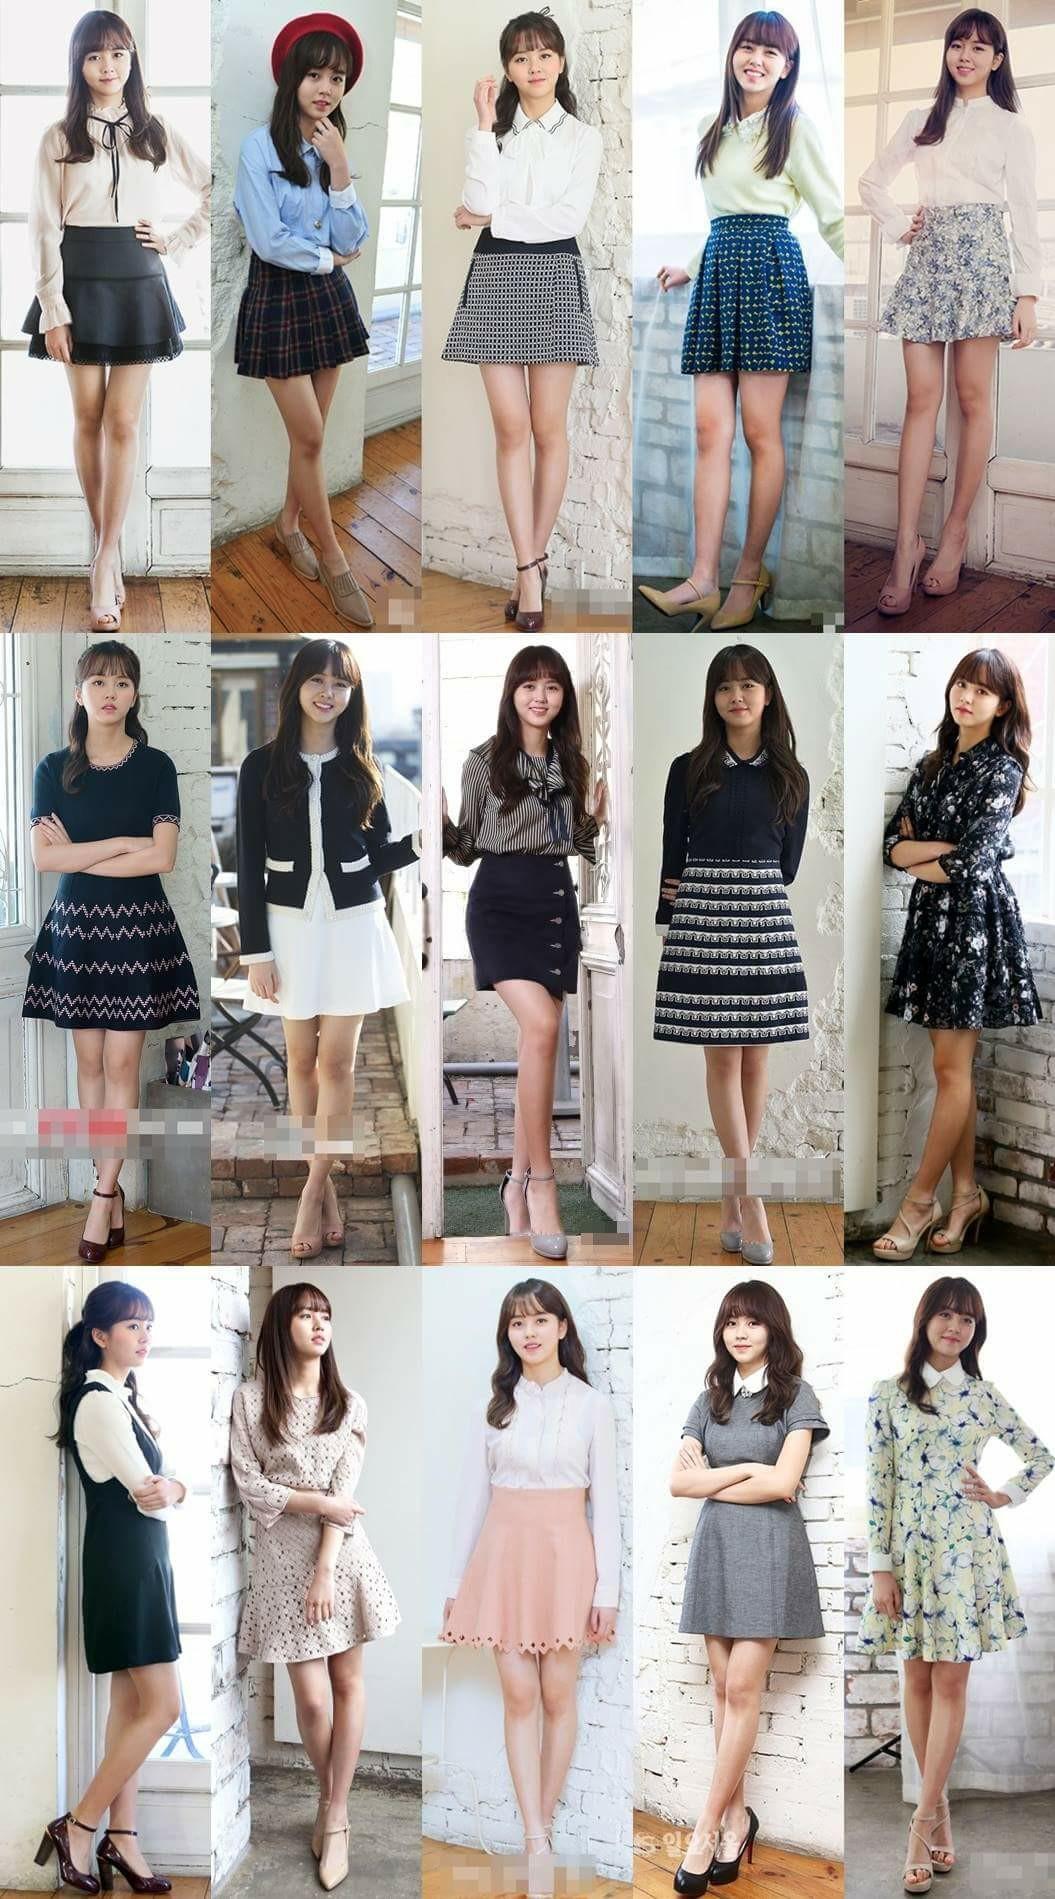 I really like Kim SoHyun's outfits